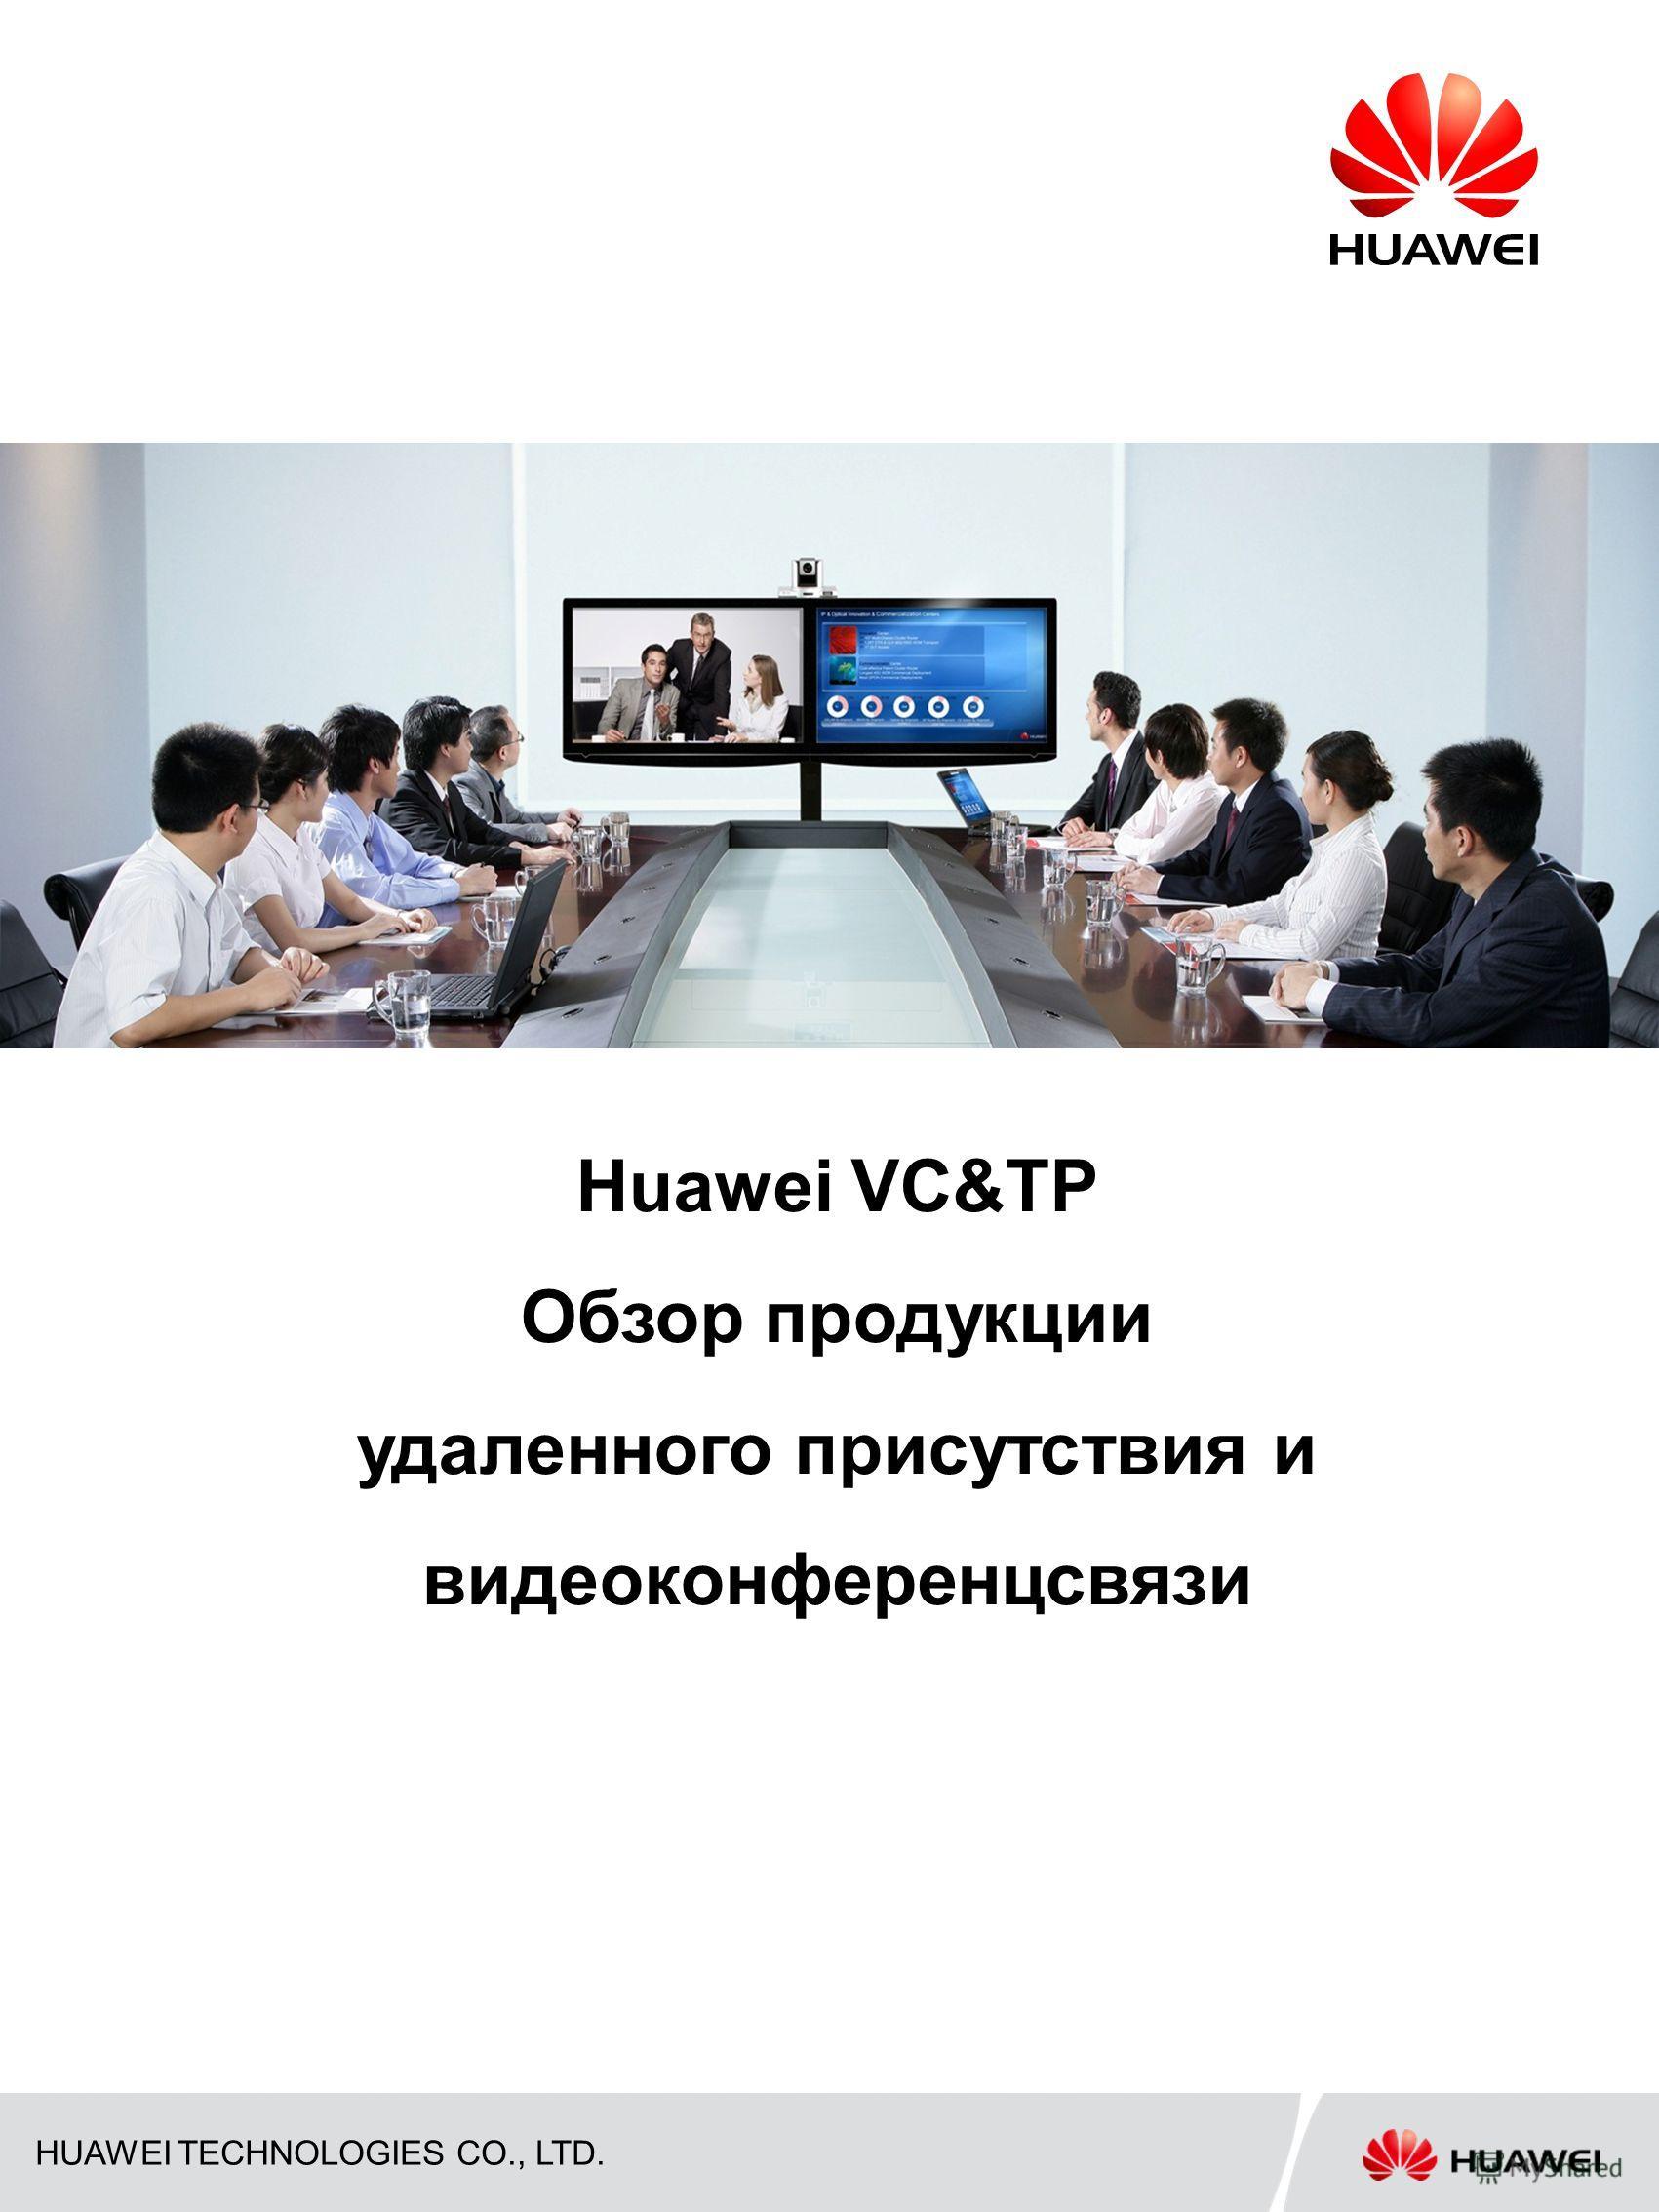 HUAWEI TECHNOLOGIES CO., LTD. Huawei VC&TP Обзор продукции удаленного присутствия и видеоконференцсвязи